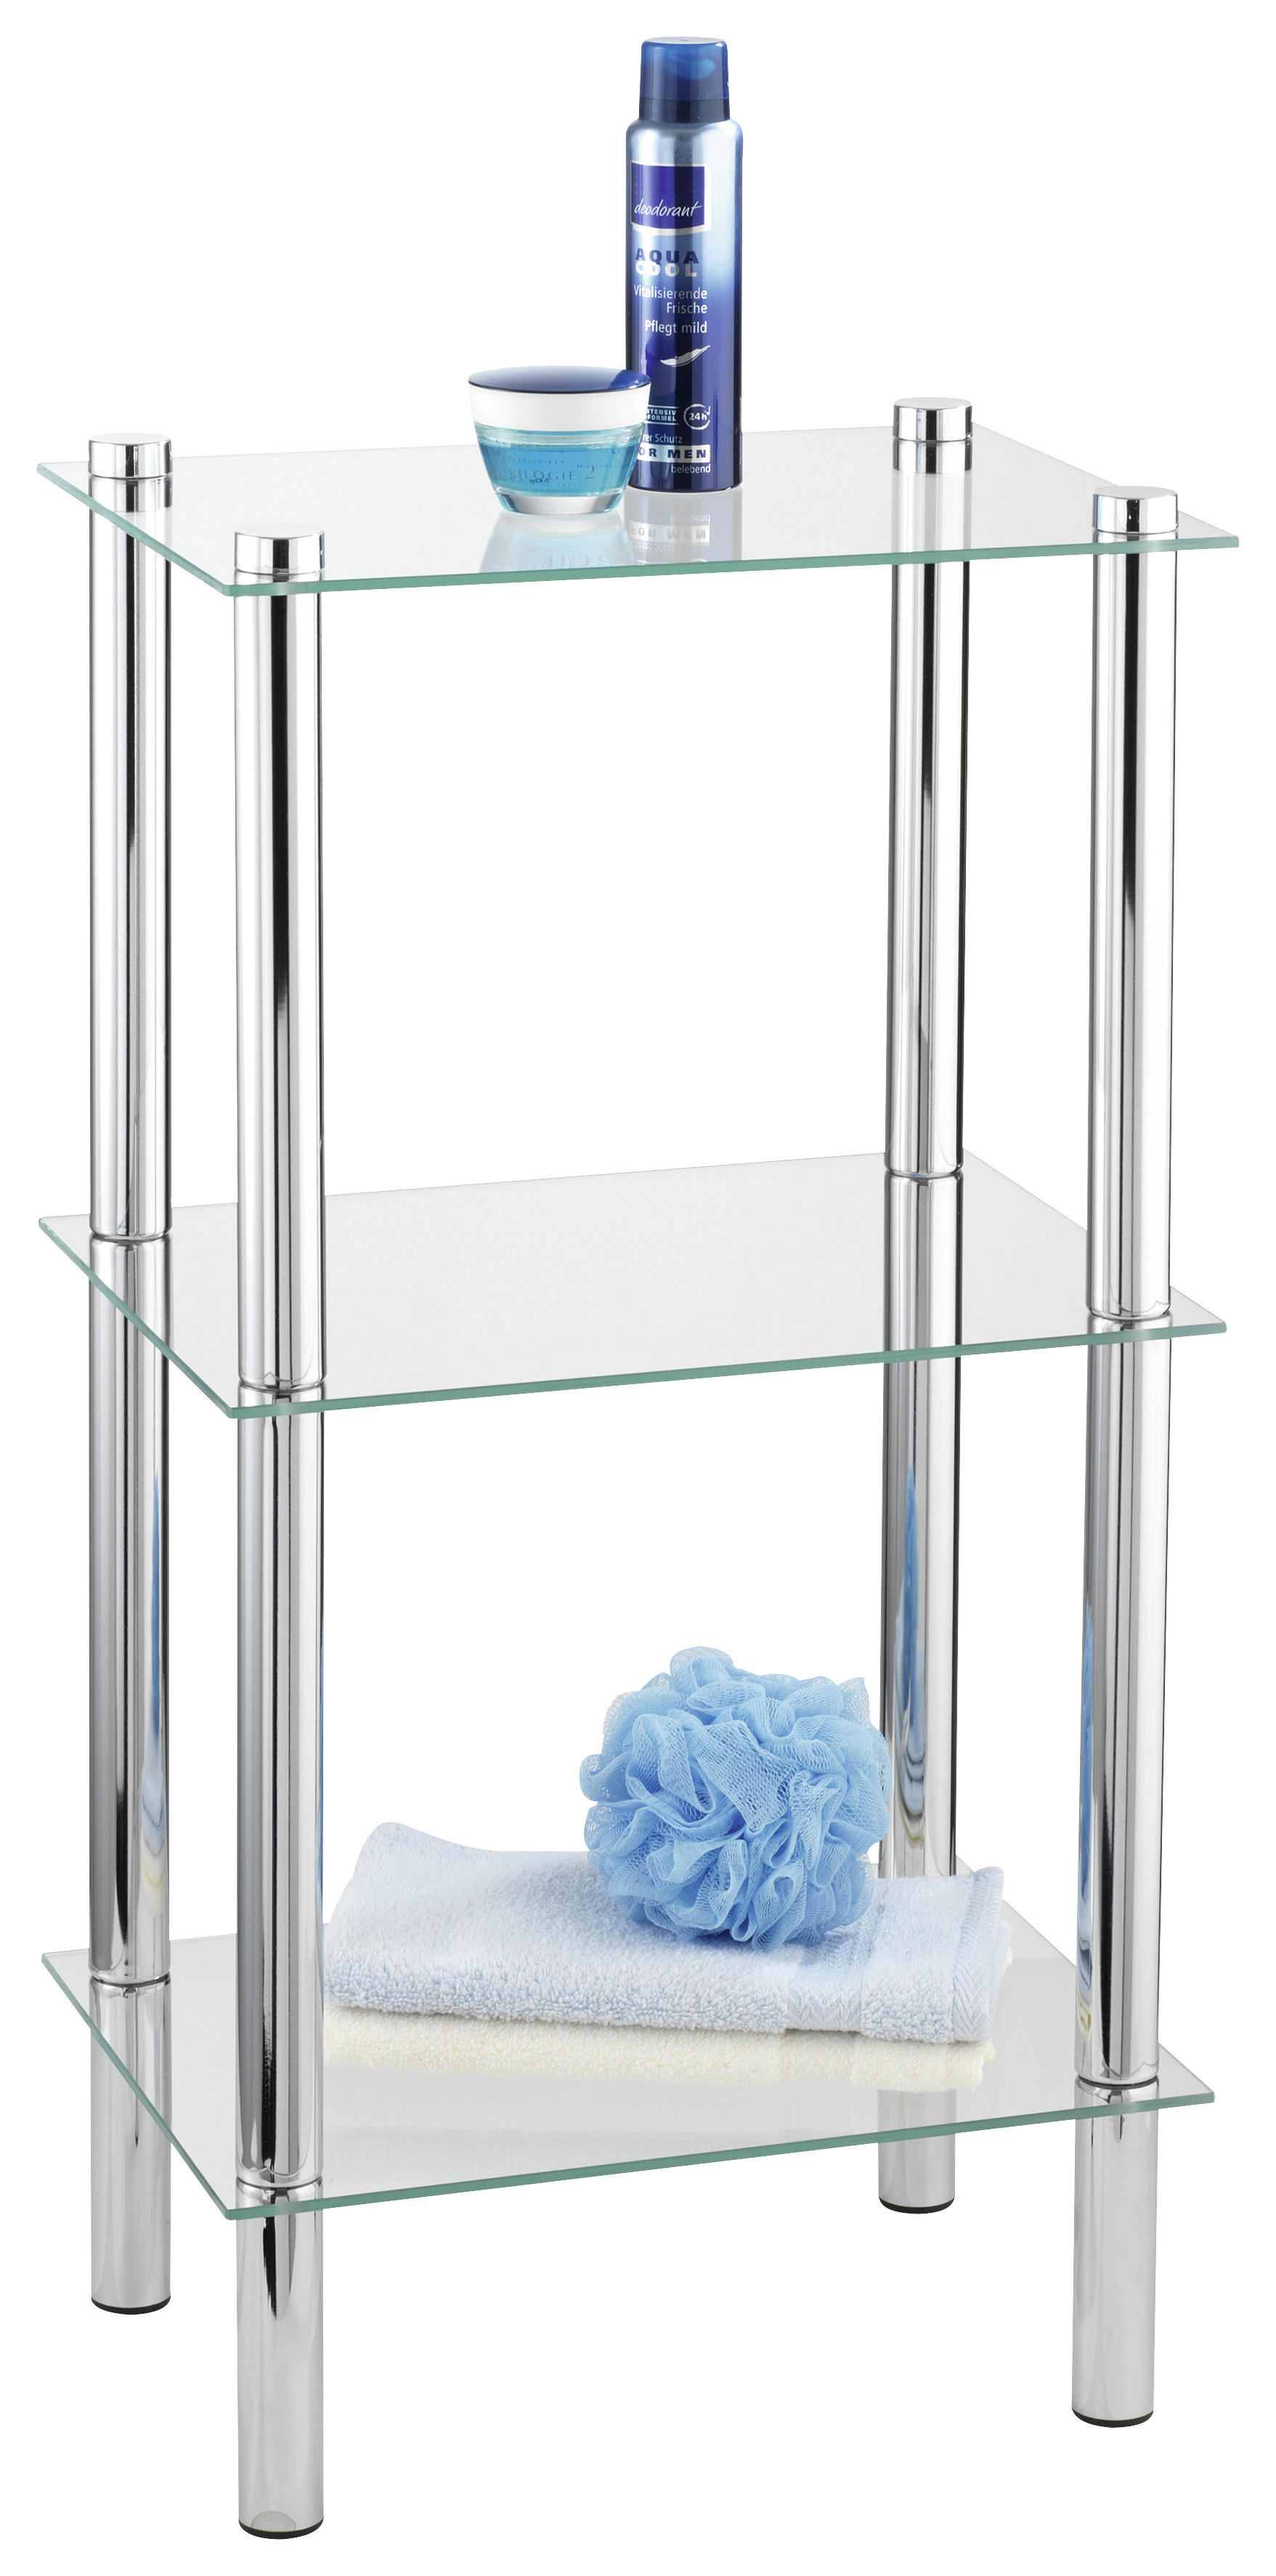 BADEZIMMERREGAL Metall, Glas Chromfarben